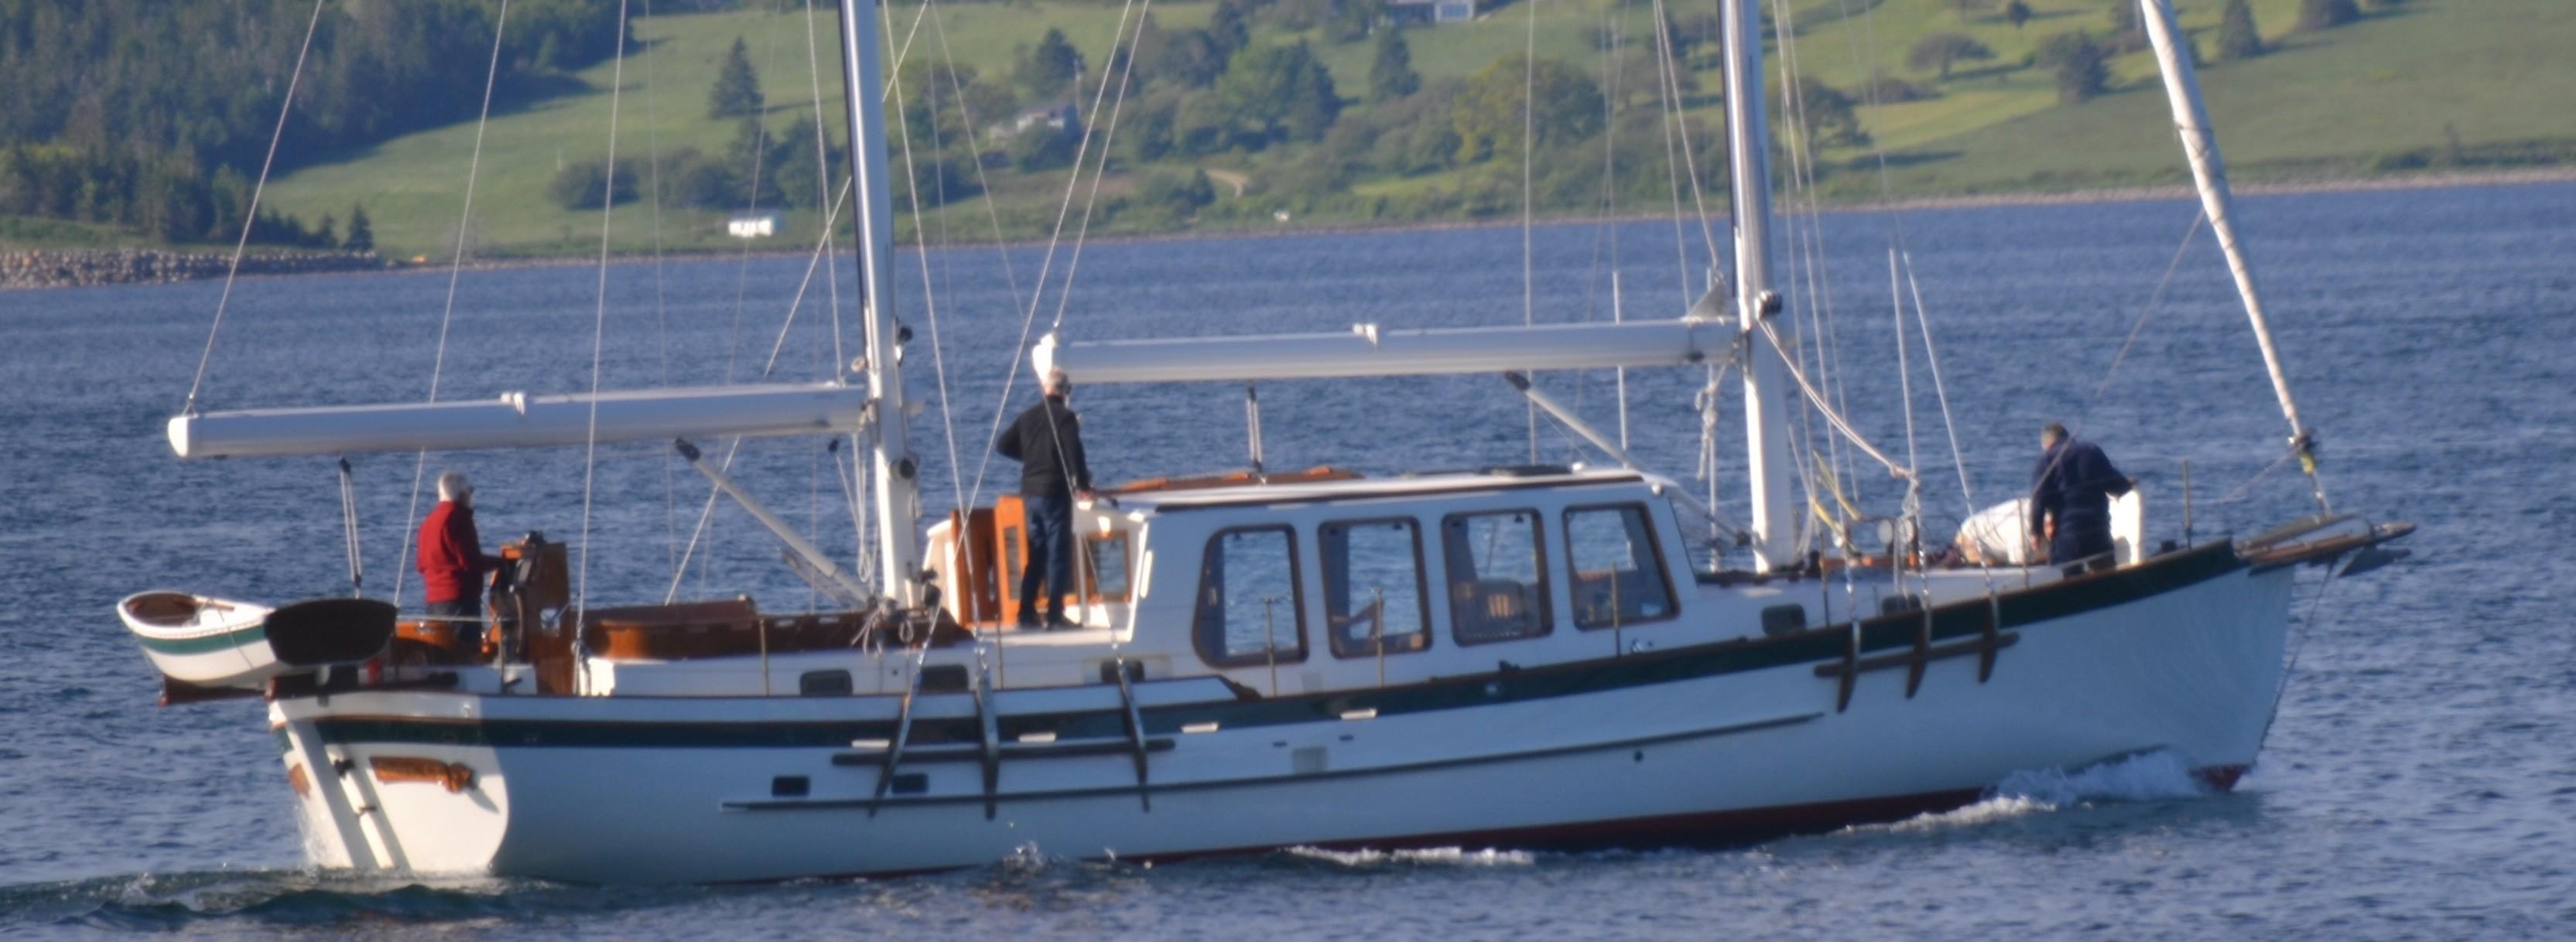 2006 Covey Island Herreshoff Ketch, United States - boats com